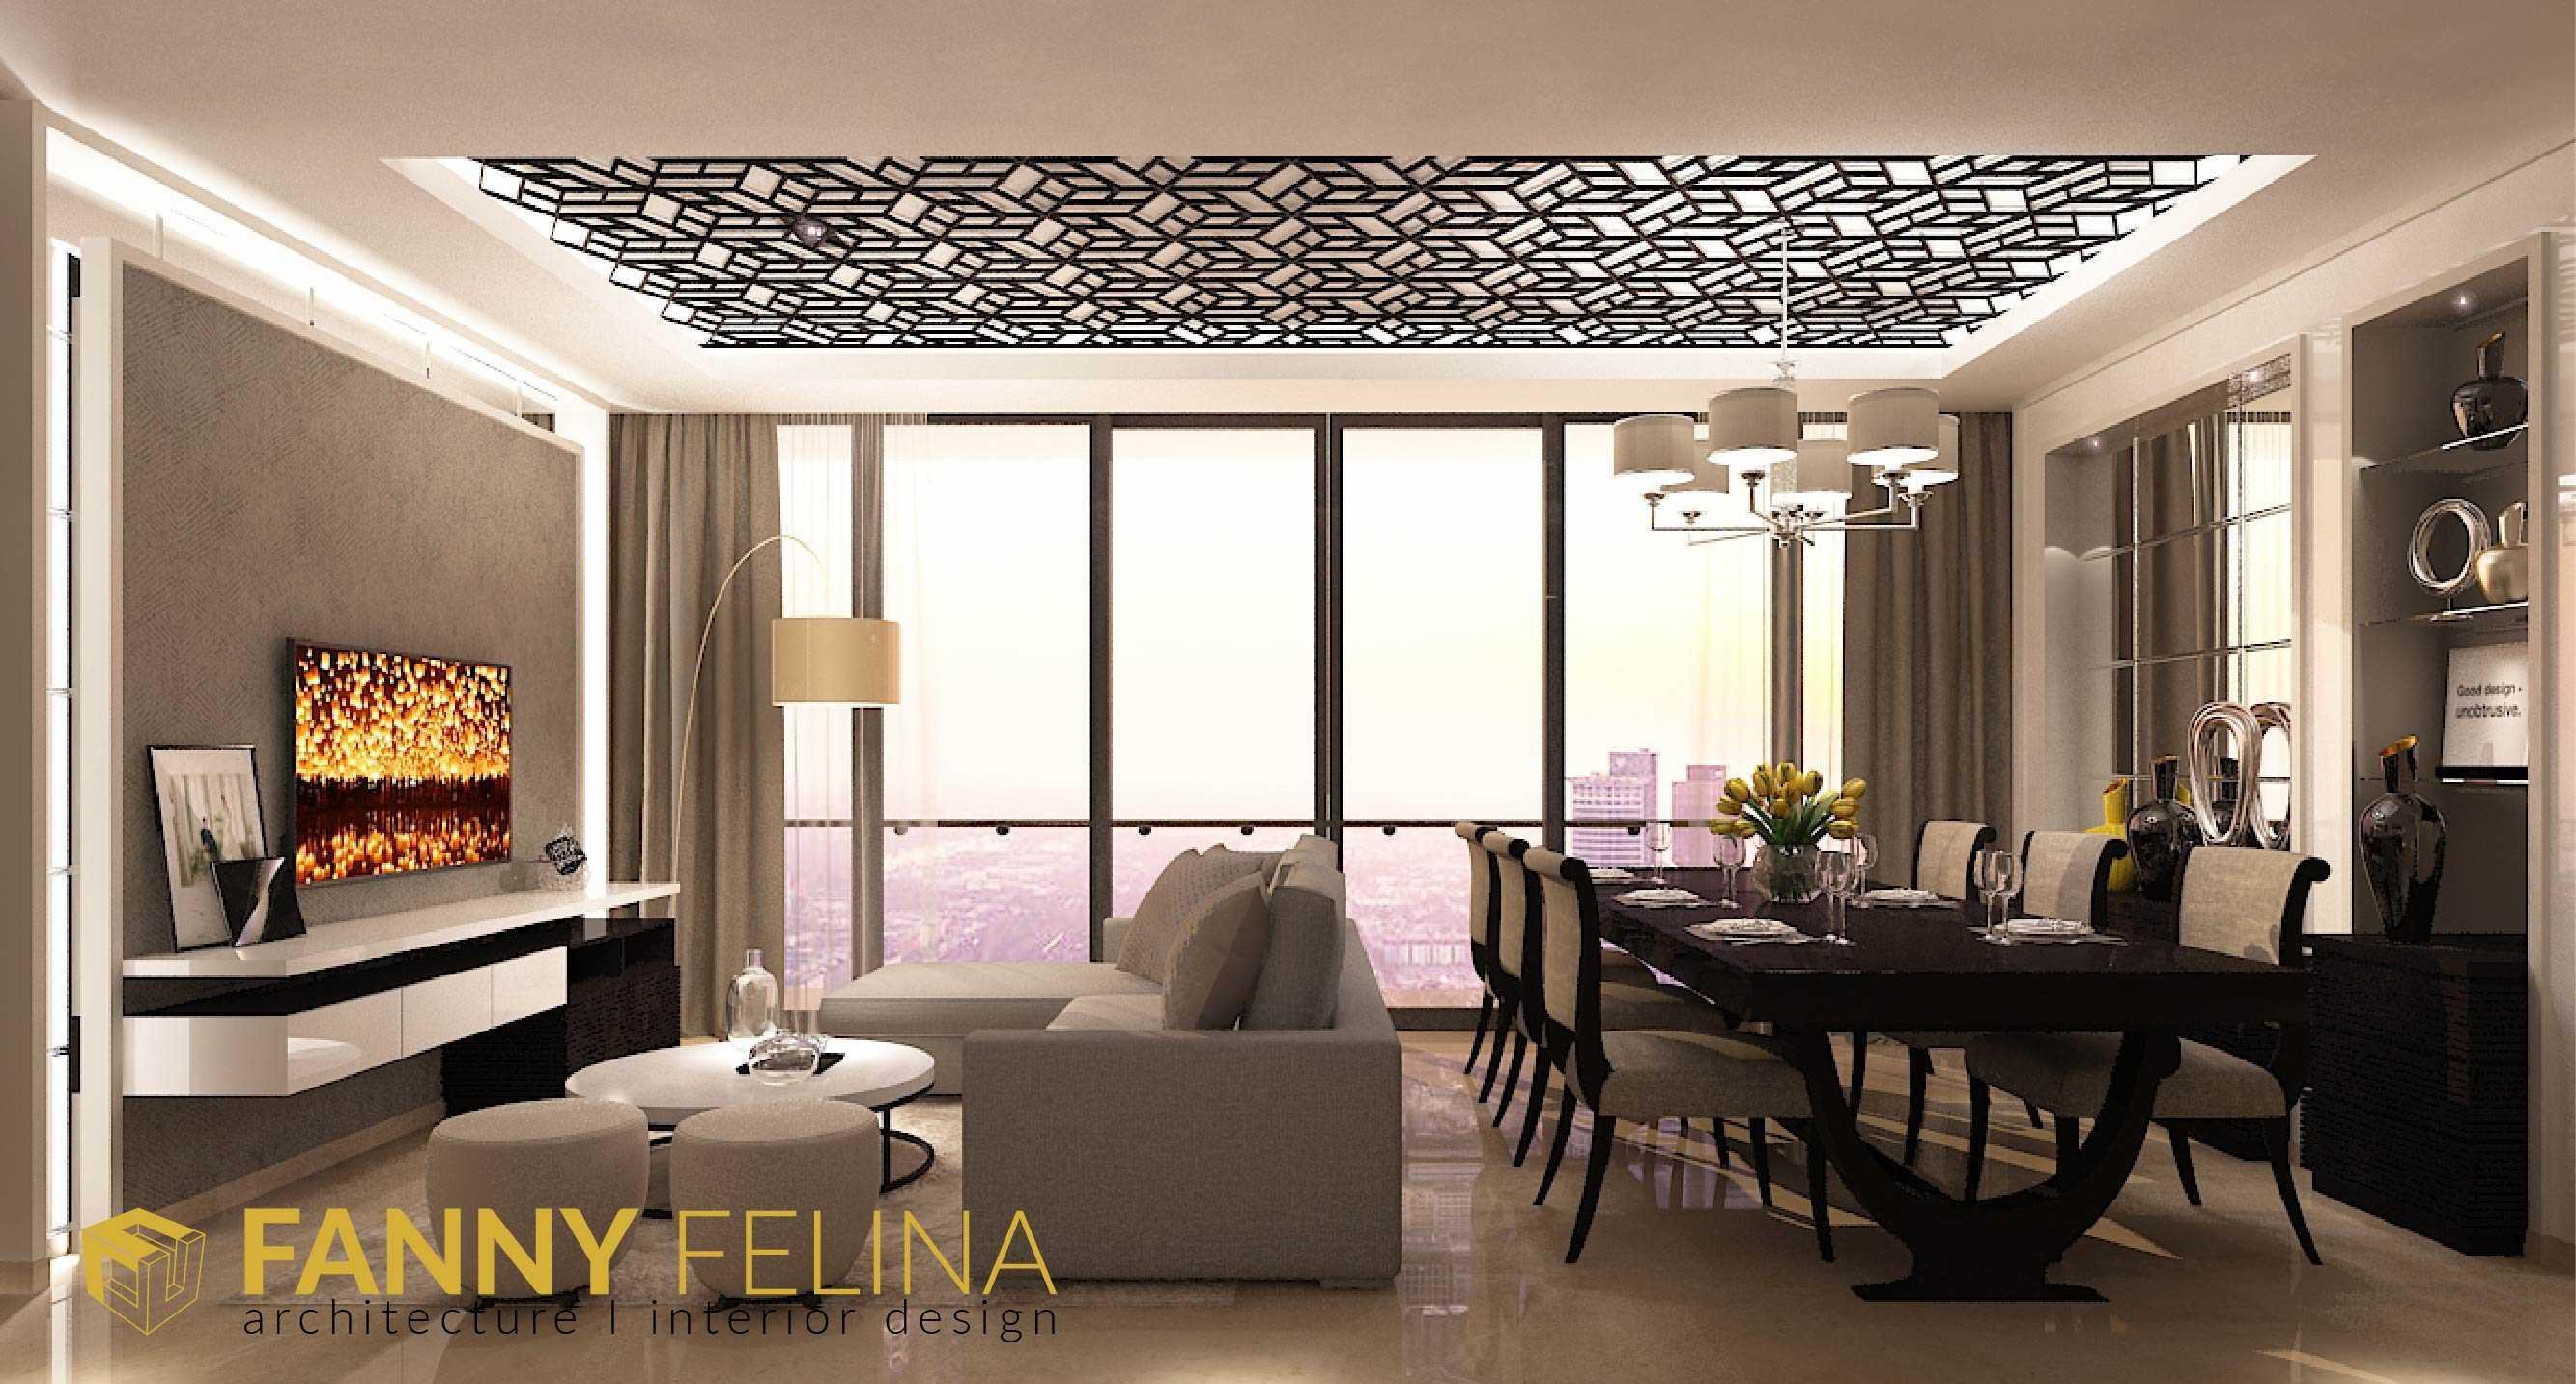 Fanny Felina Architecture & Interior Design Voila Apartment Surabaya, Surabaya City, East Java, Indonesia Surabaya, Surabaya City, East Java, Indonesia Voila-03 Kontemporer  41194